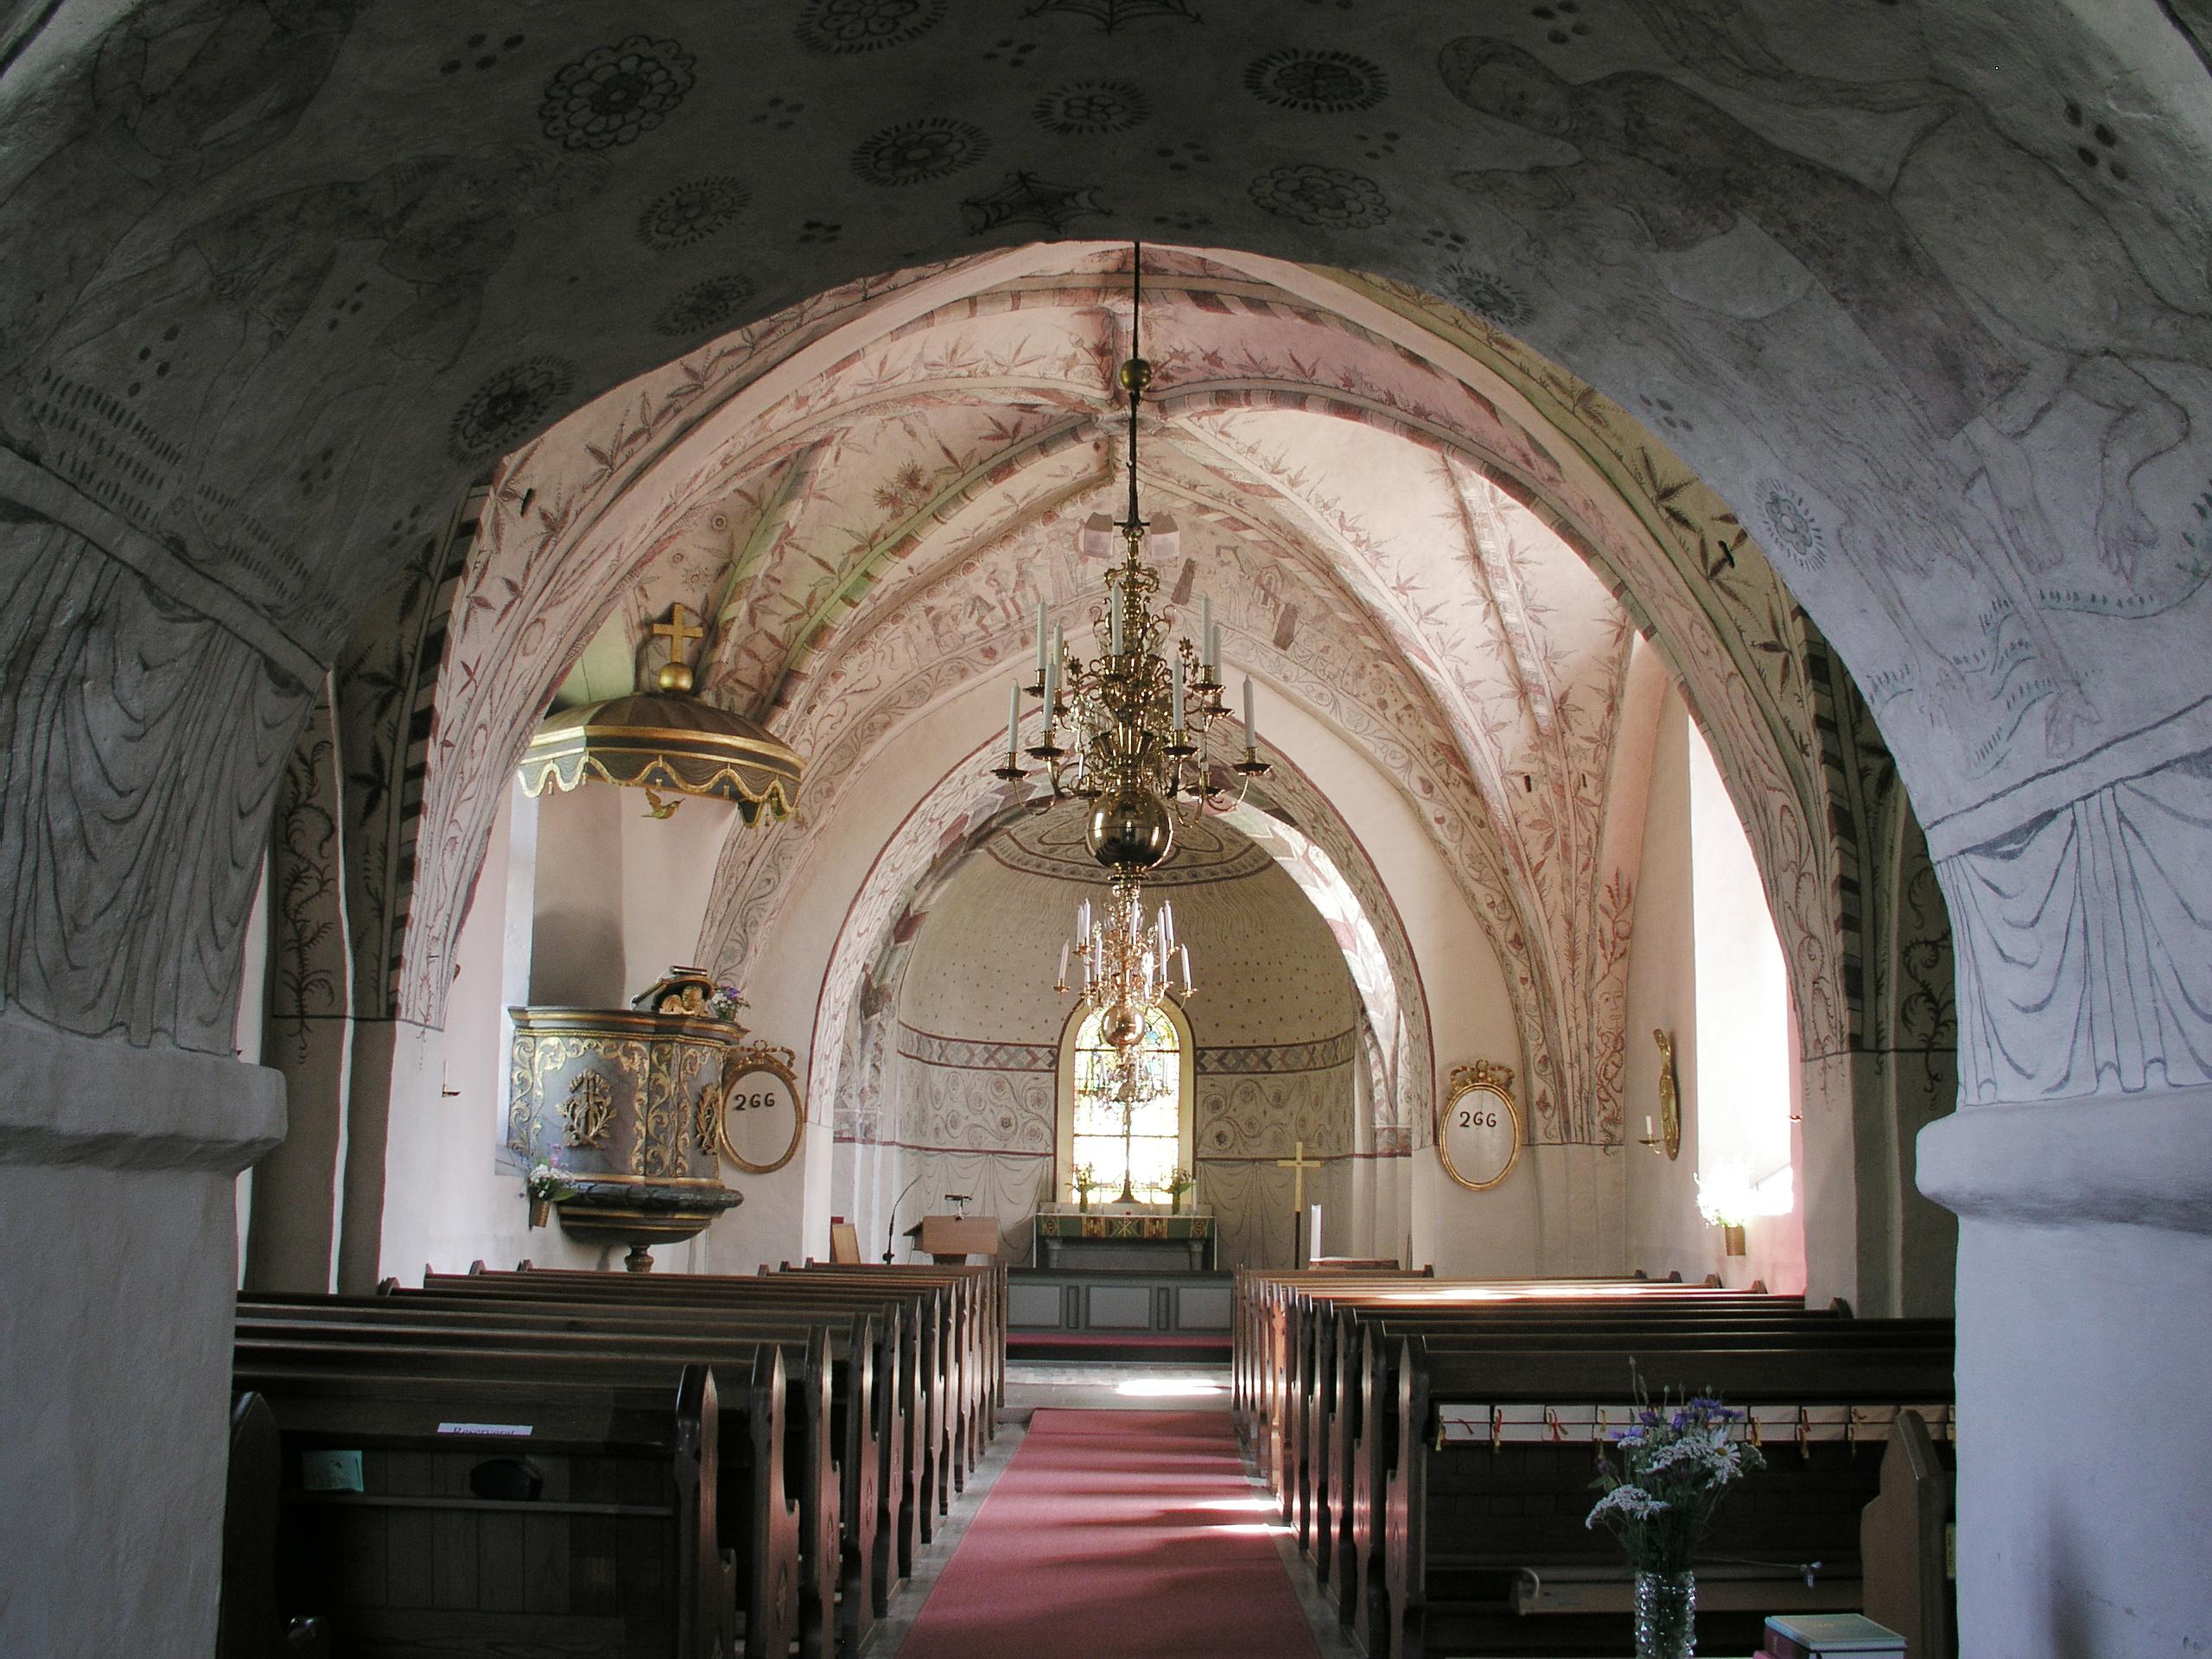 http://upload.wikimedia.org/wikipedia/commons/8/80/Kaga_kyrka_nave4.jpg